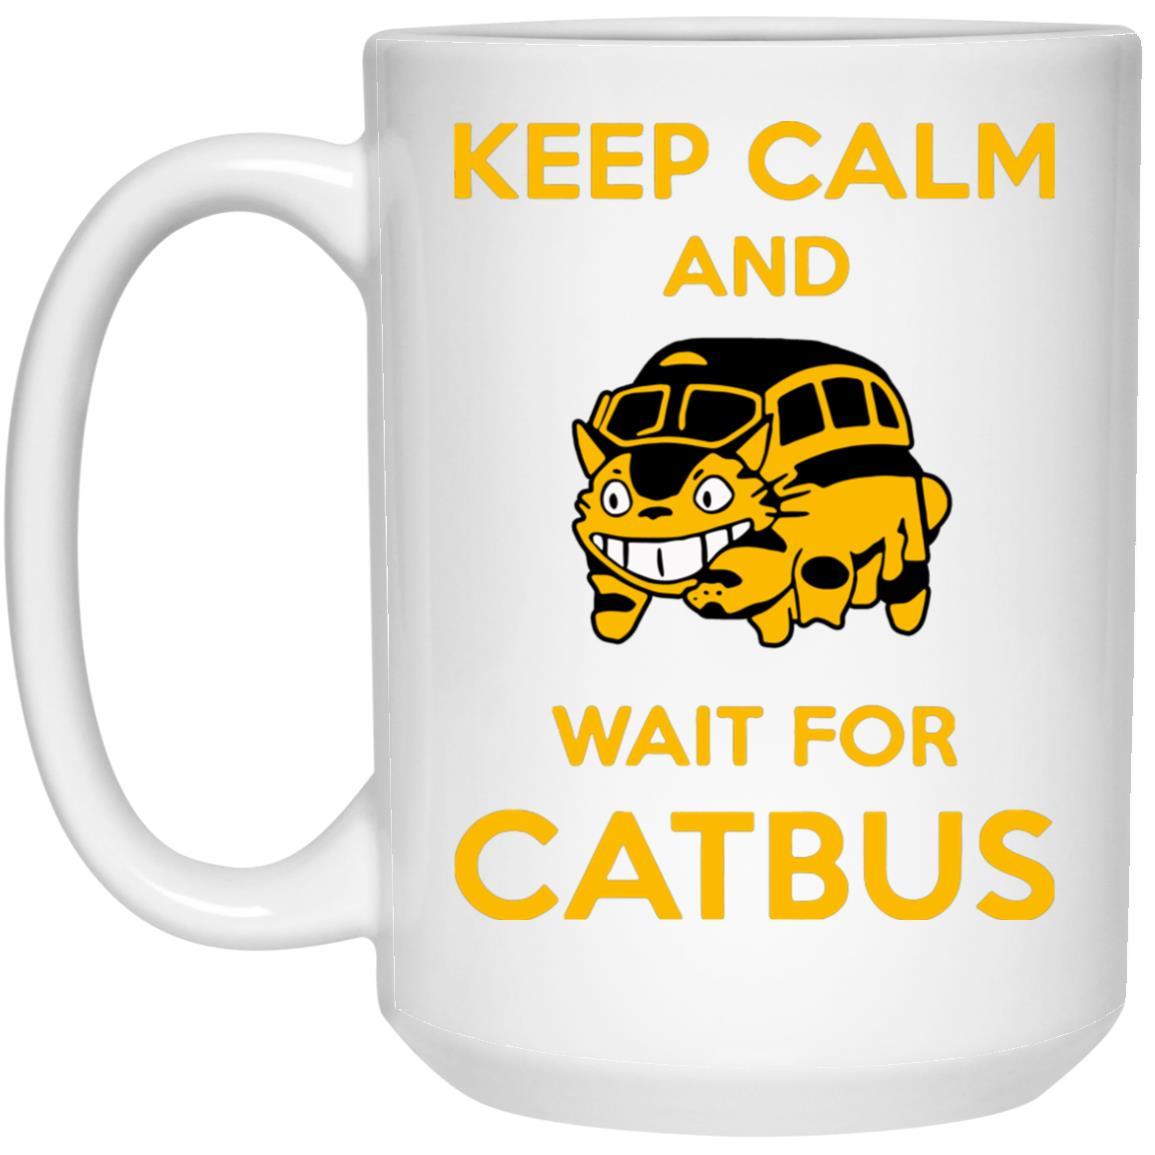 My Neighbor Totoro Keep Calm and Wait for Cat Bus Mug